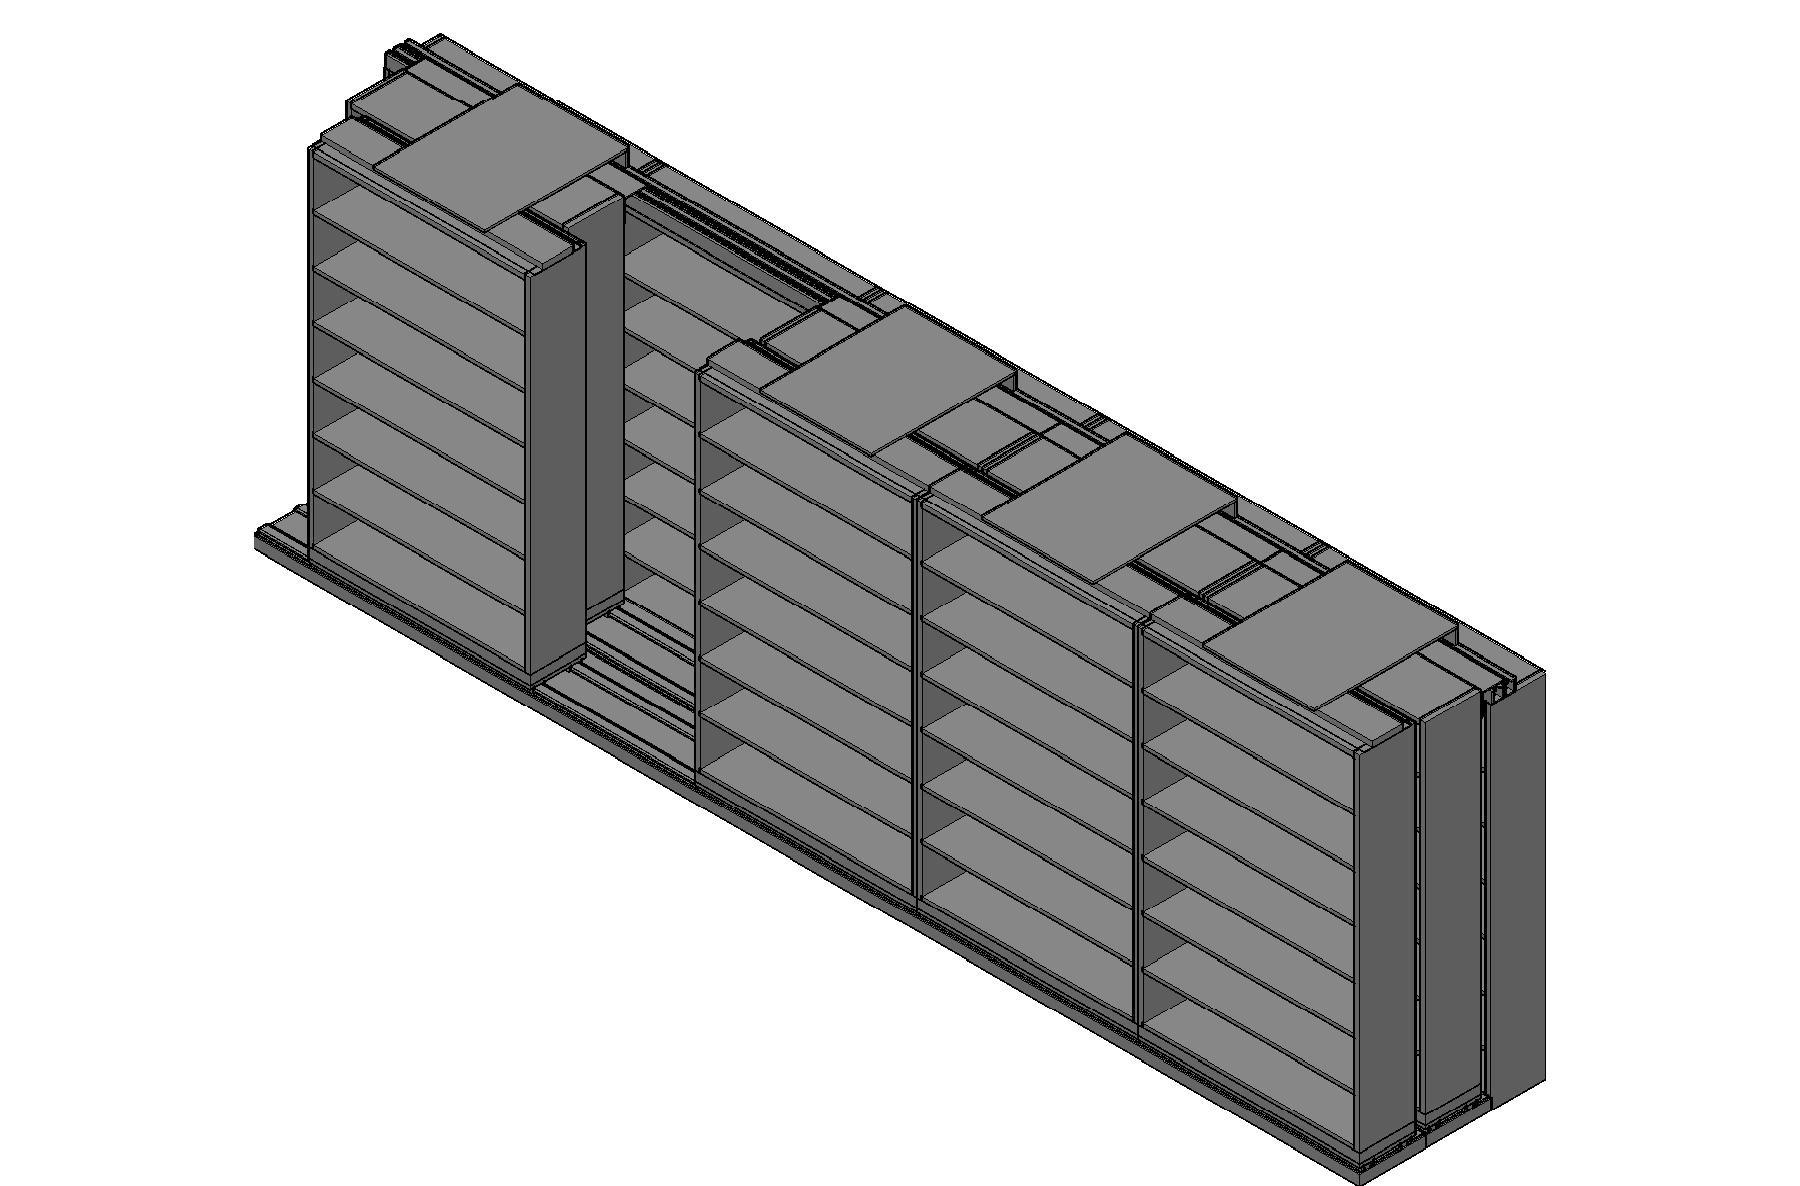 "Letter Size Sliding Shelves - 3 Rows Deep - 7 Levels - (48"" x 12"" Shelves) - 244"" Total Width"